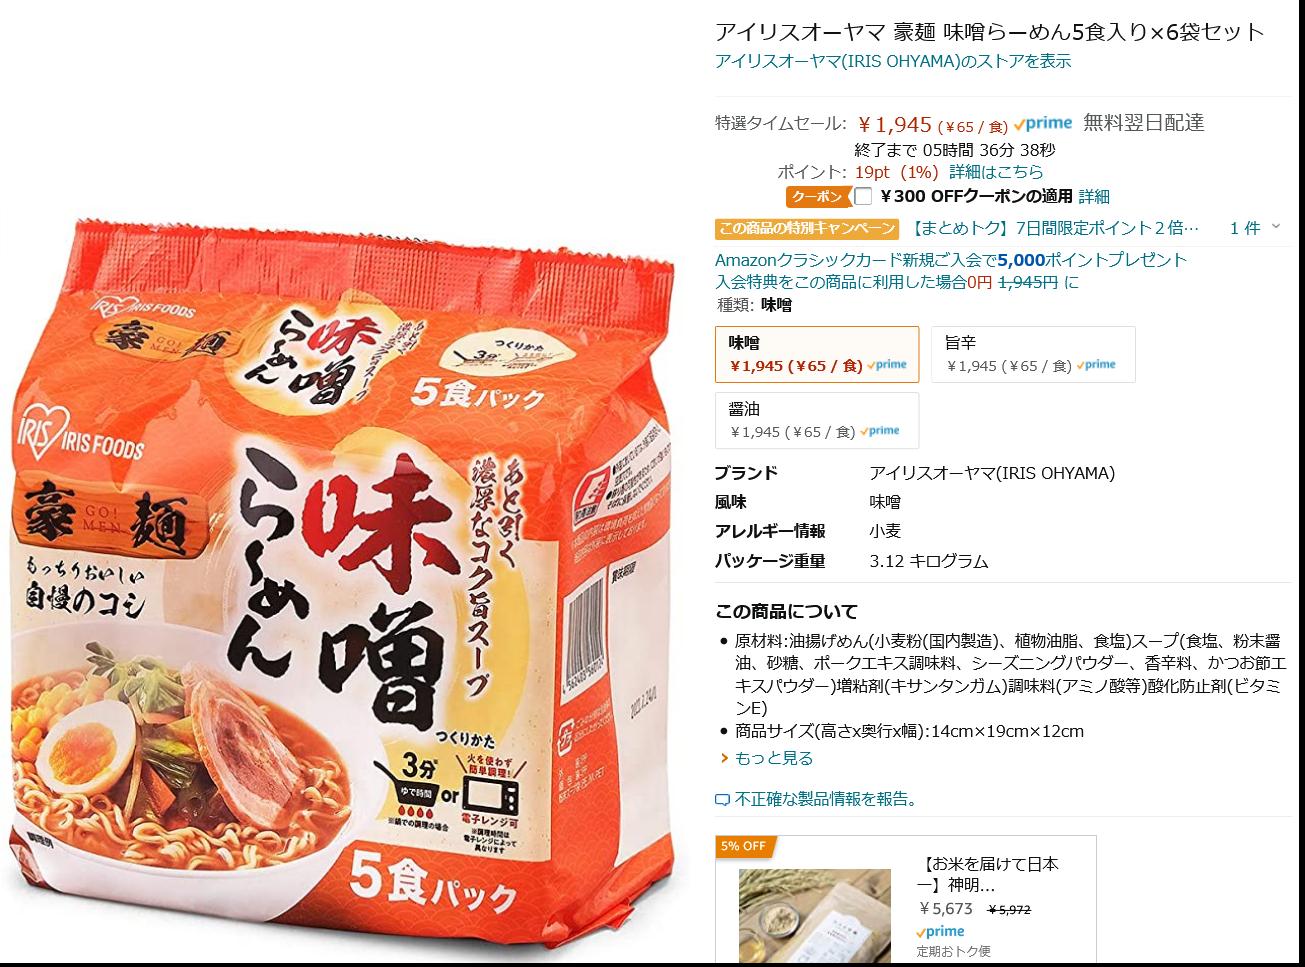 Screenshot_2021-03-23 Amazon アイリスオーヤマ 豪麺 味噌らーめん5食入り×6袋セット アイリスオーヤマ(IRIS OHYAMA) 食品・飲料・お酒 通販